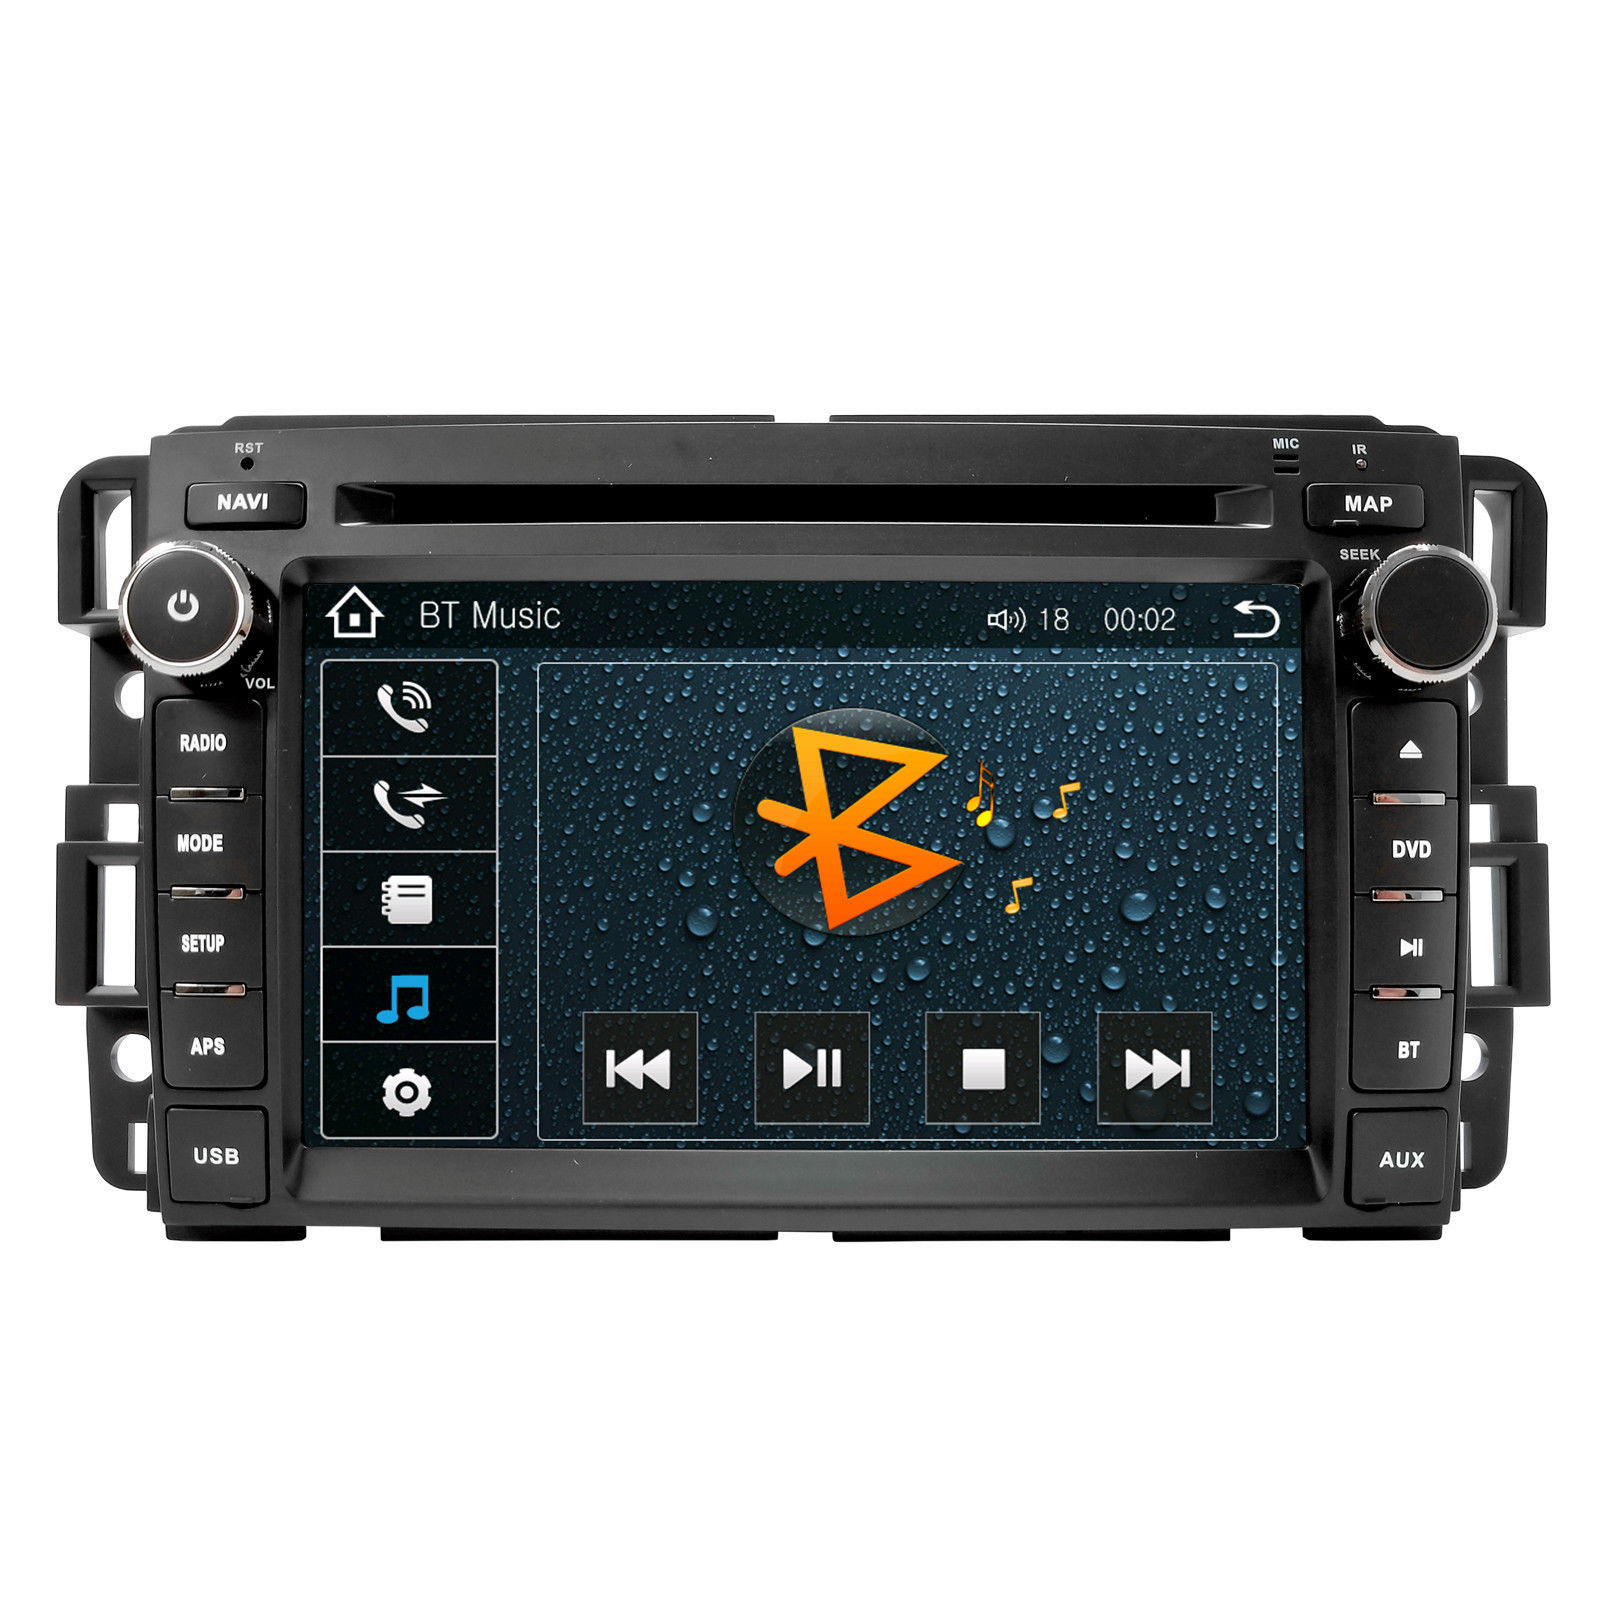 CHEVROLET EXPRESS VAN 2007-2010 GPS NAVIGATION BLUETOOTH TOUCHSCREEN RADIO image 4